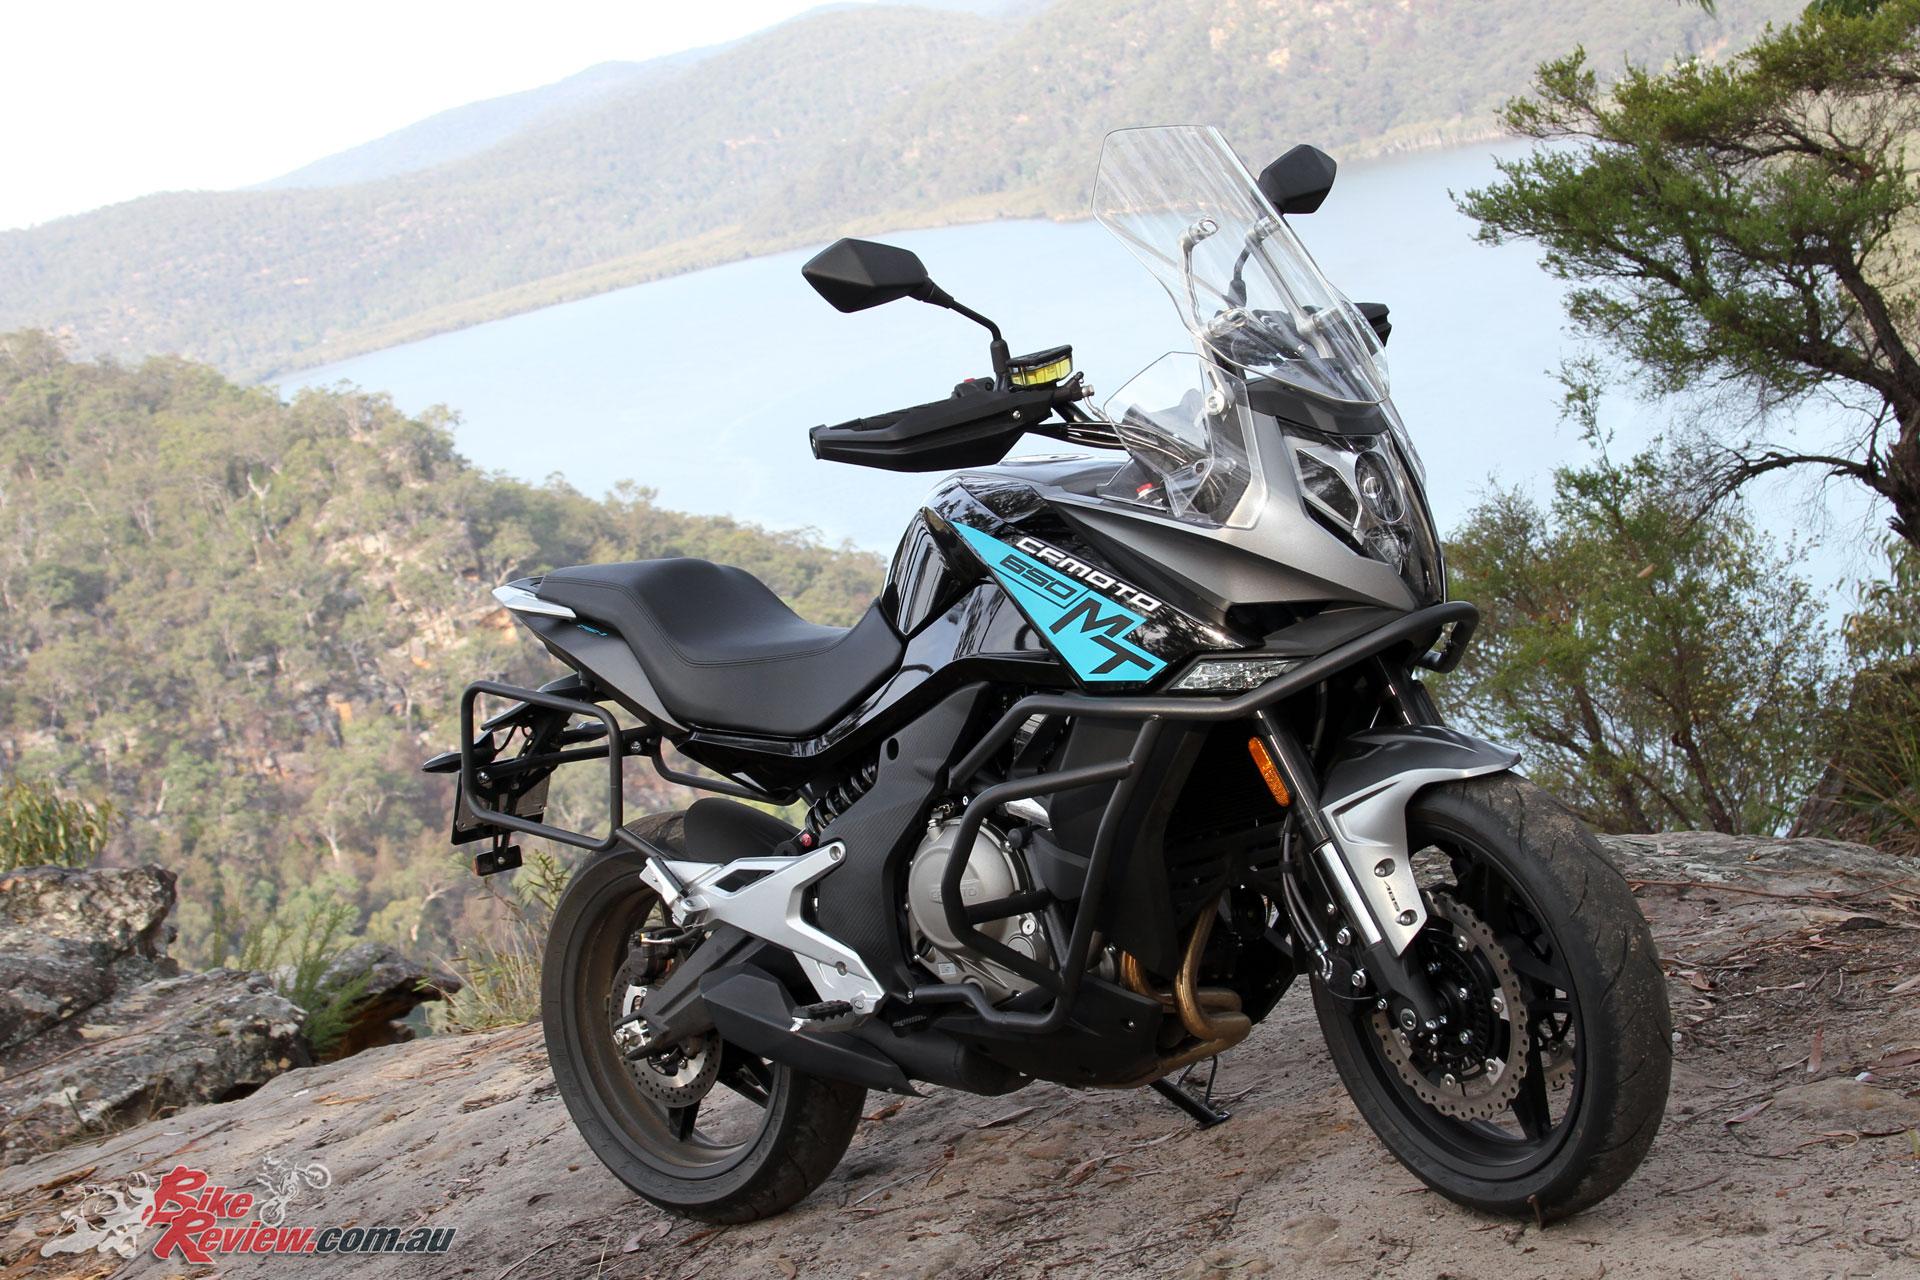 Review: 2018 CFMoto 650 MT (LAMS) - Bike Review